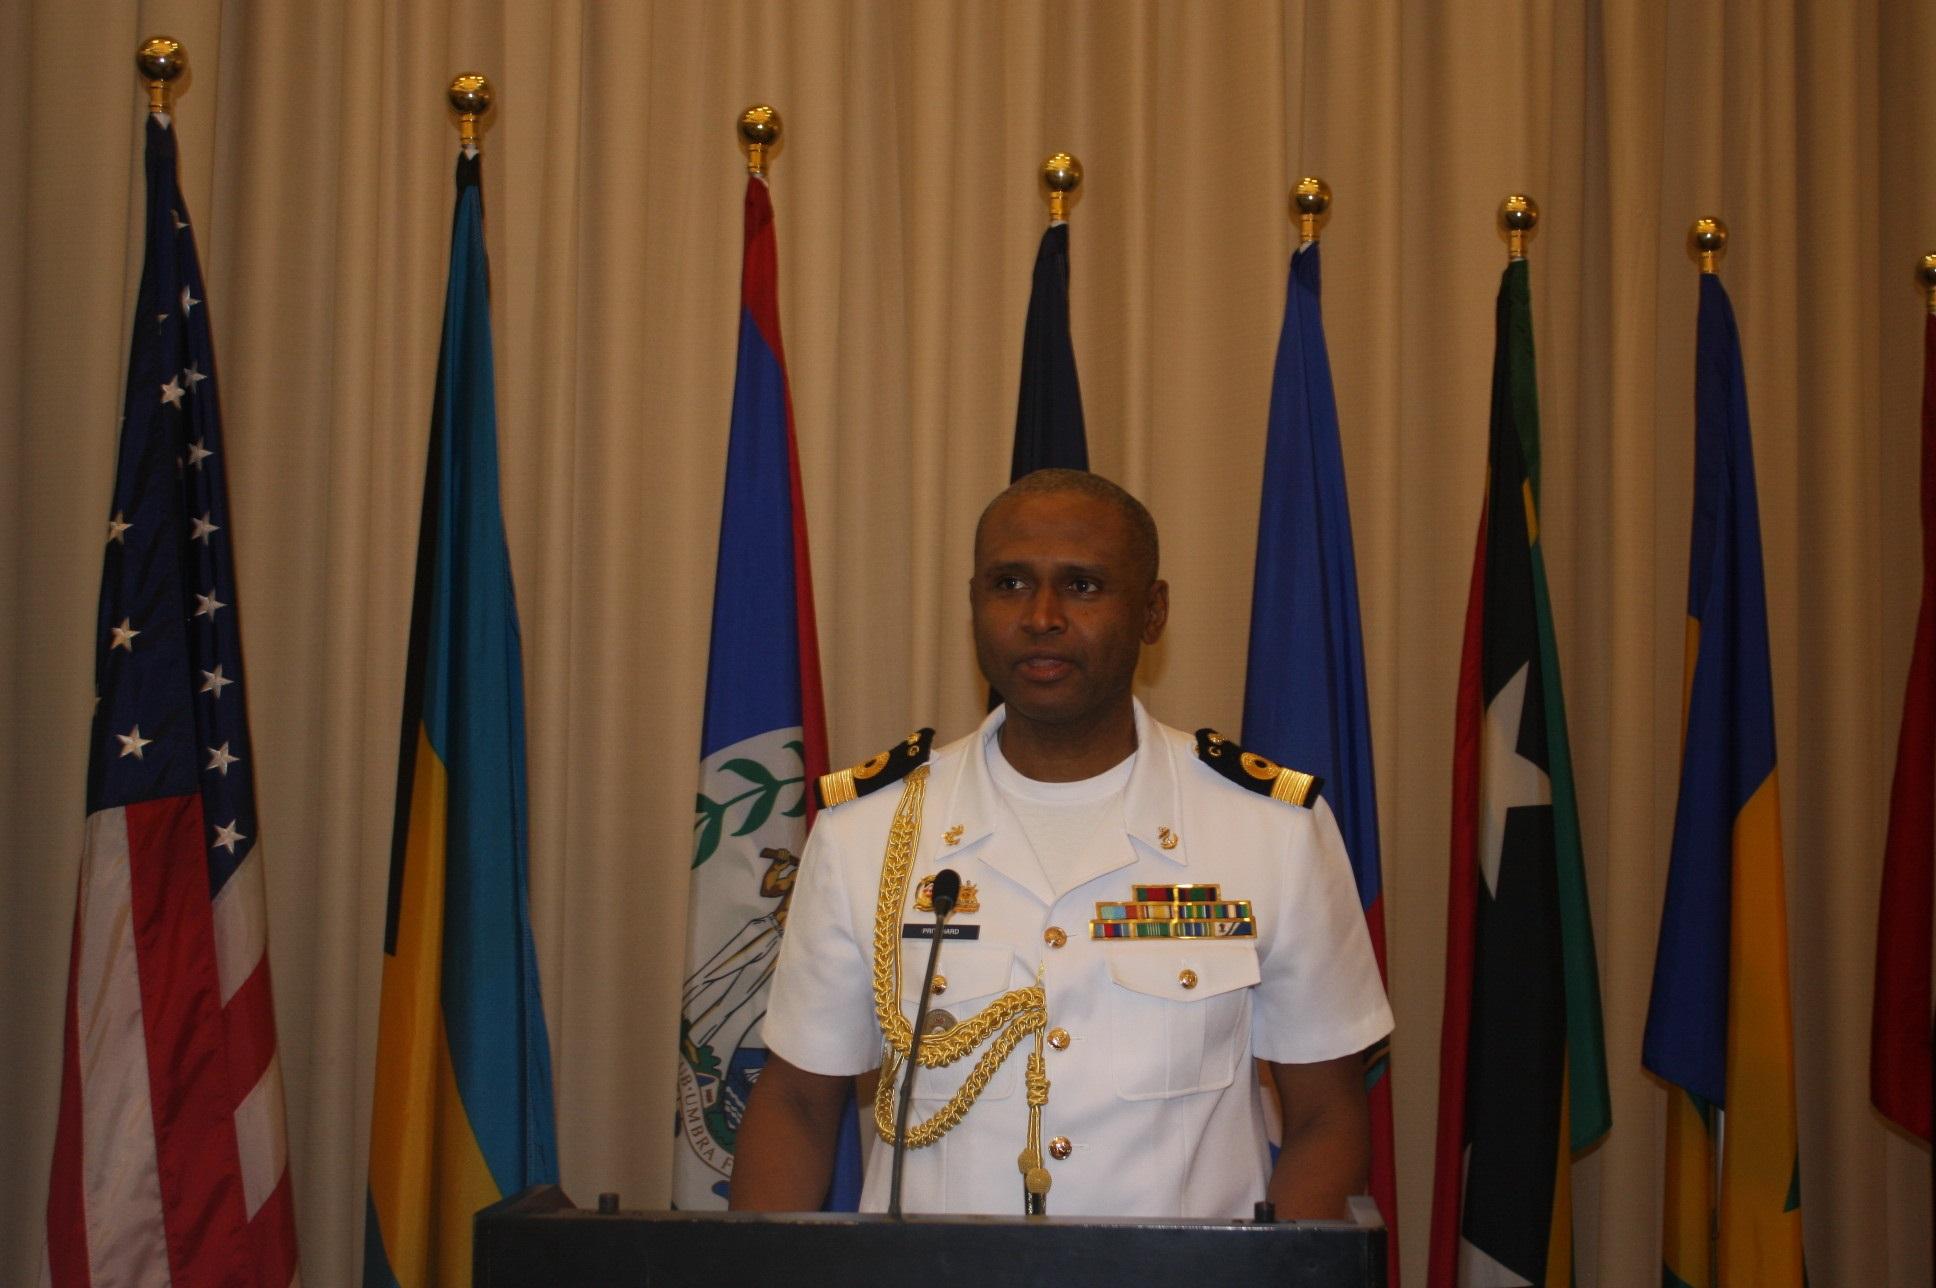 Caribbean Commitment against Illicit Networks